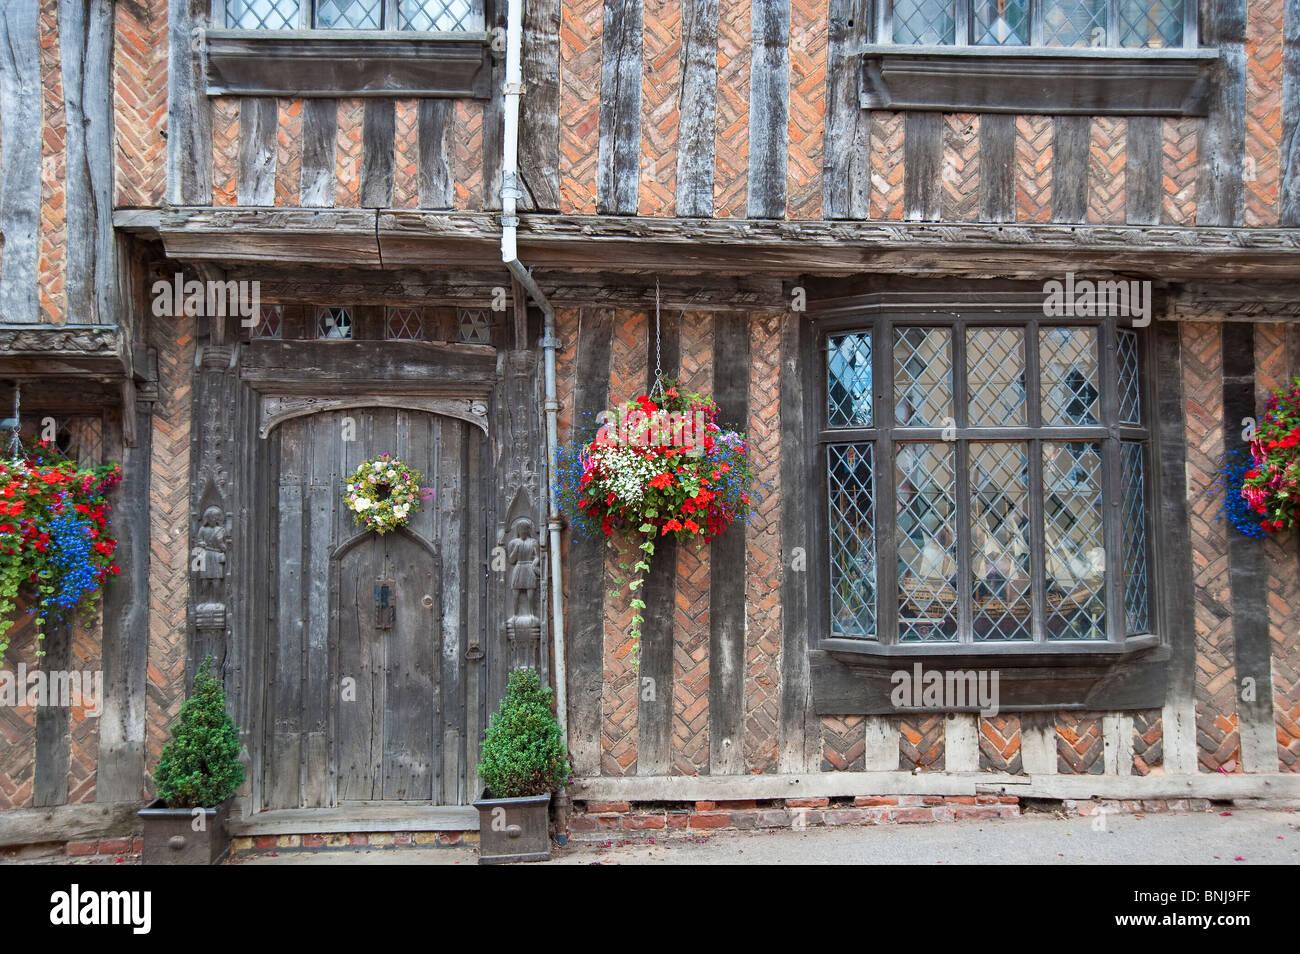 Historic 16 century timber framed buildings in Lavenham Suffolk - Stock Image